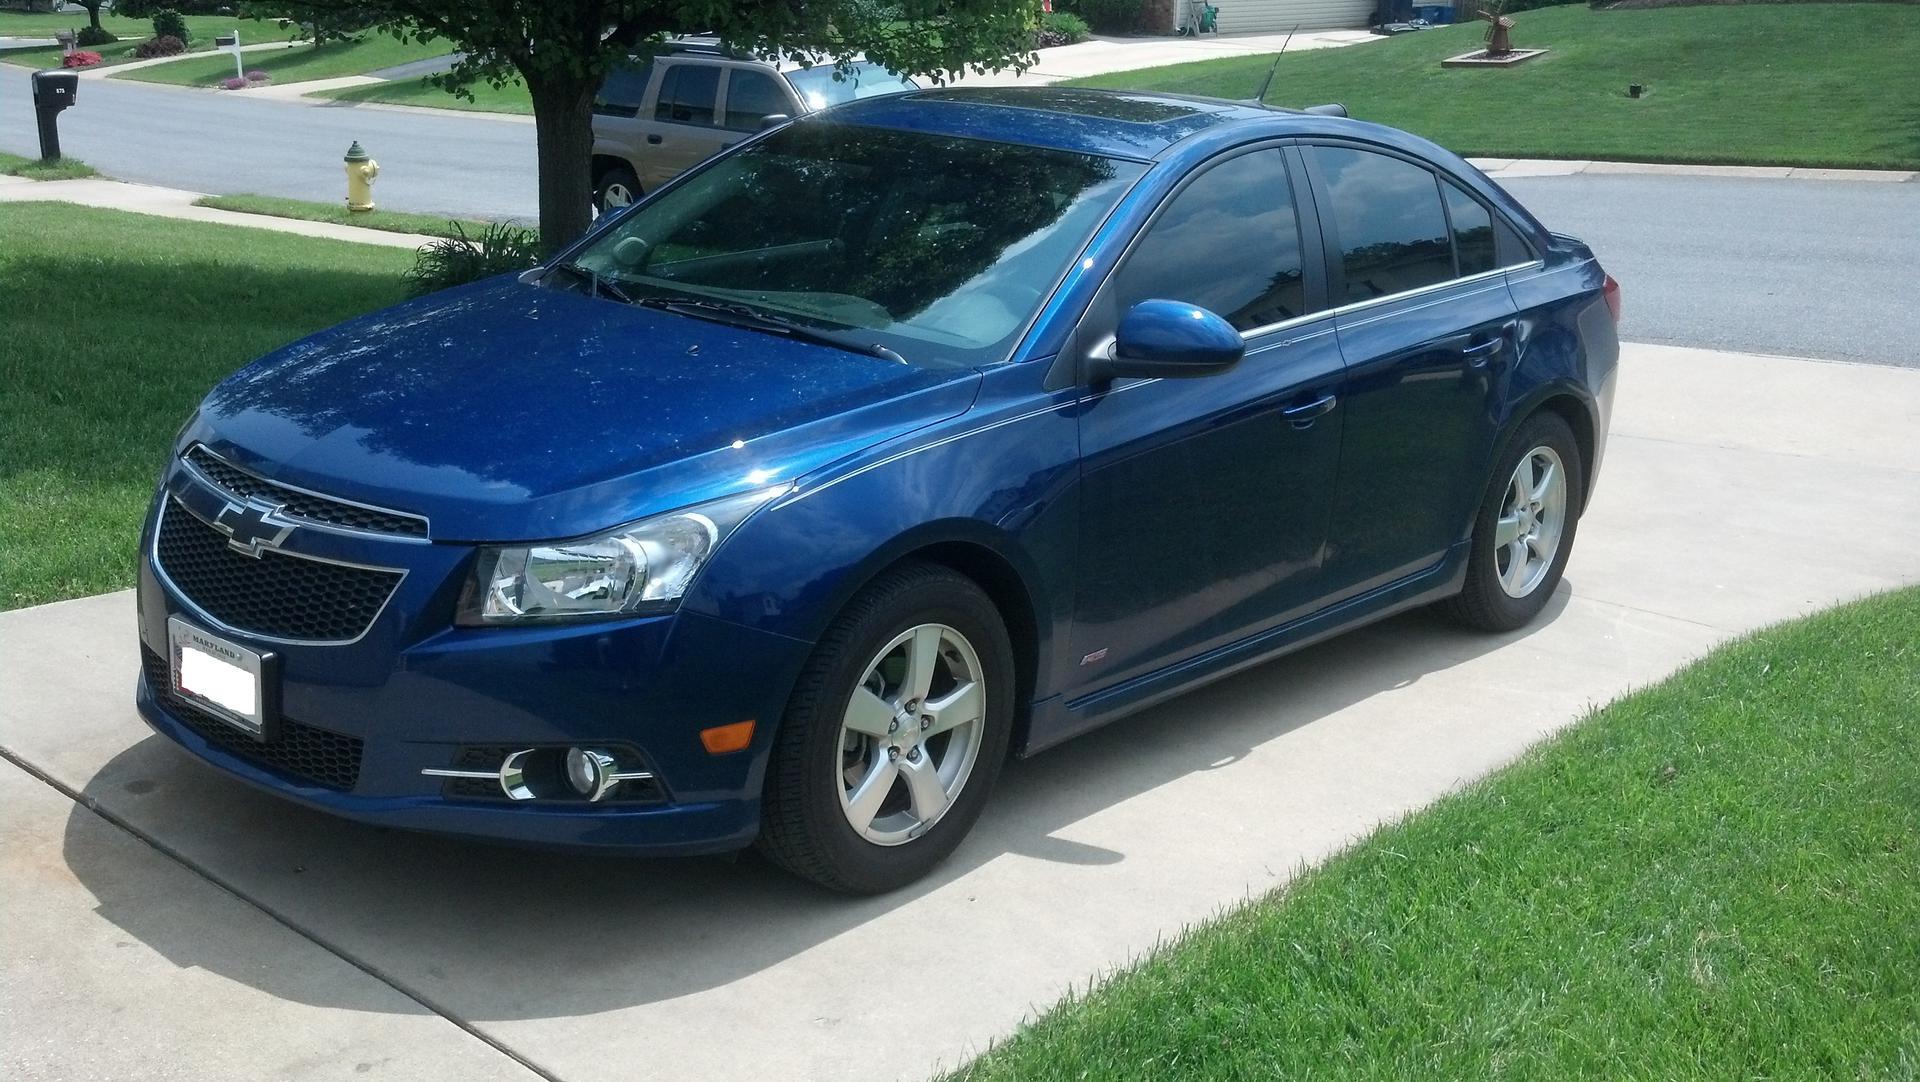 2014 Chevrolet Cruze 1lt >> Window Tint on the blue topaz Cruze